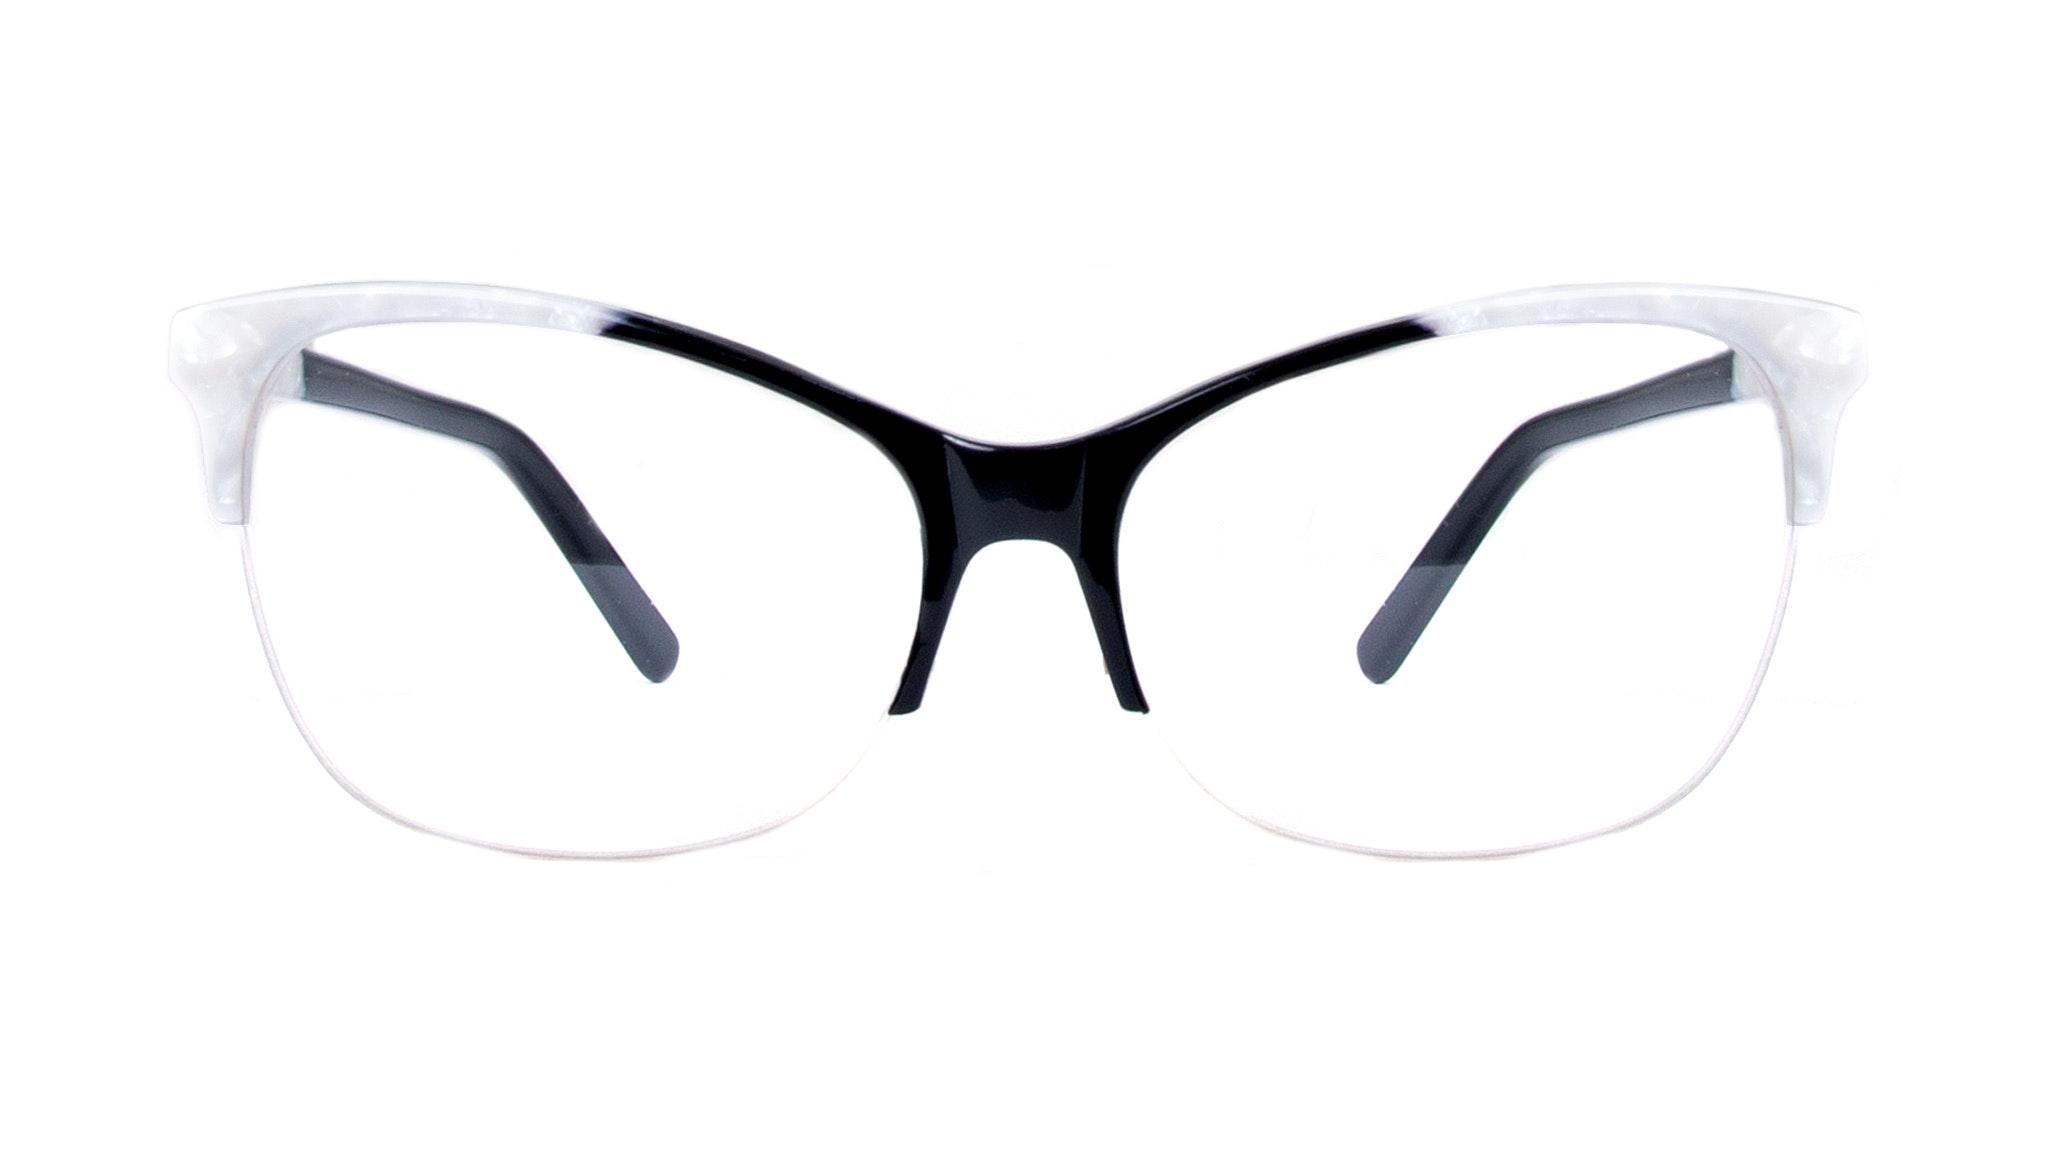 Affordable Fashion Glasses Cat Eye Rectangle Semi-Rimless Eyeglasses Women Flair Light Onyx Pearl Front